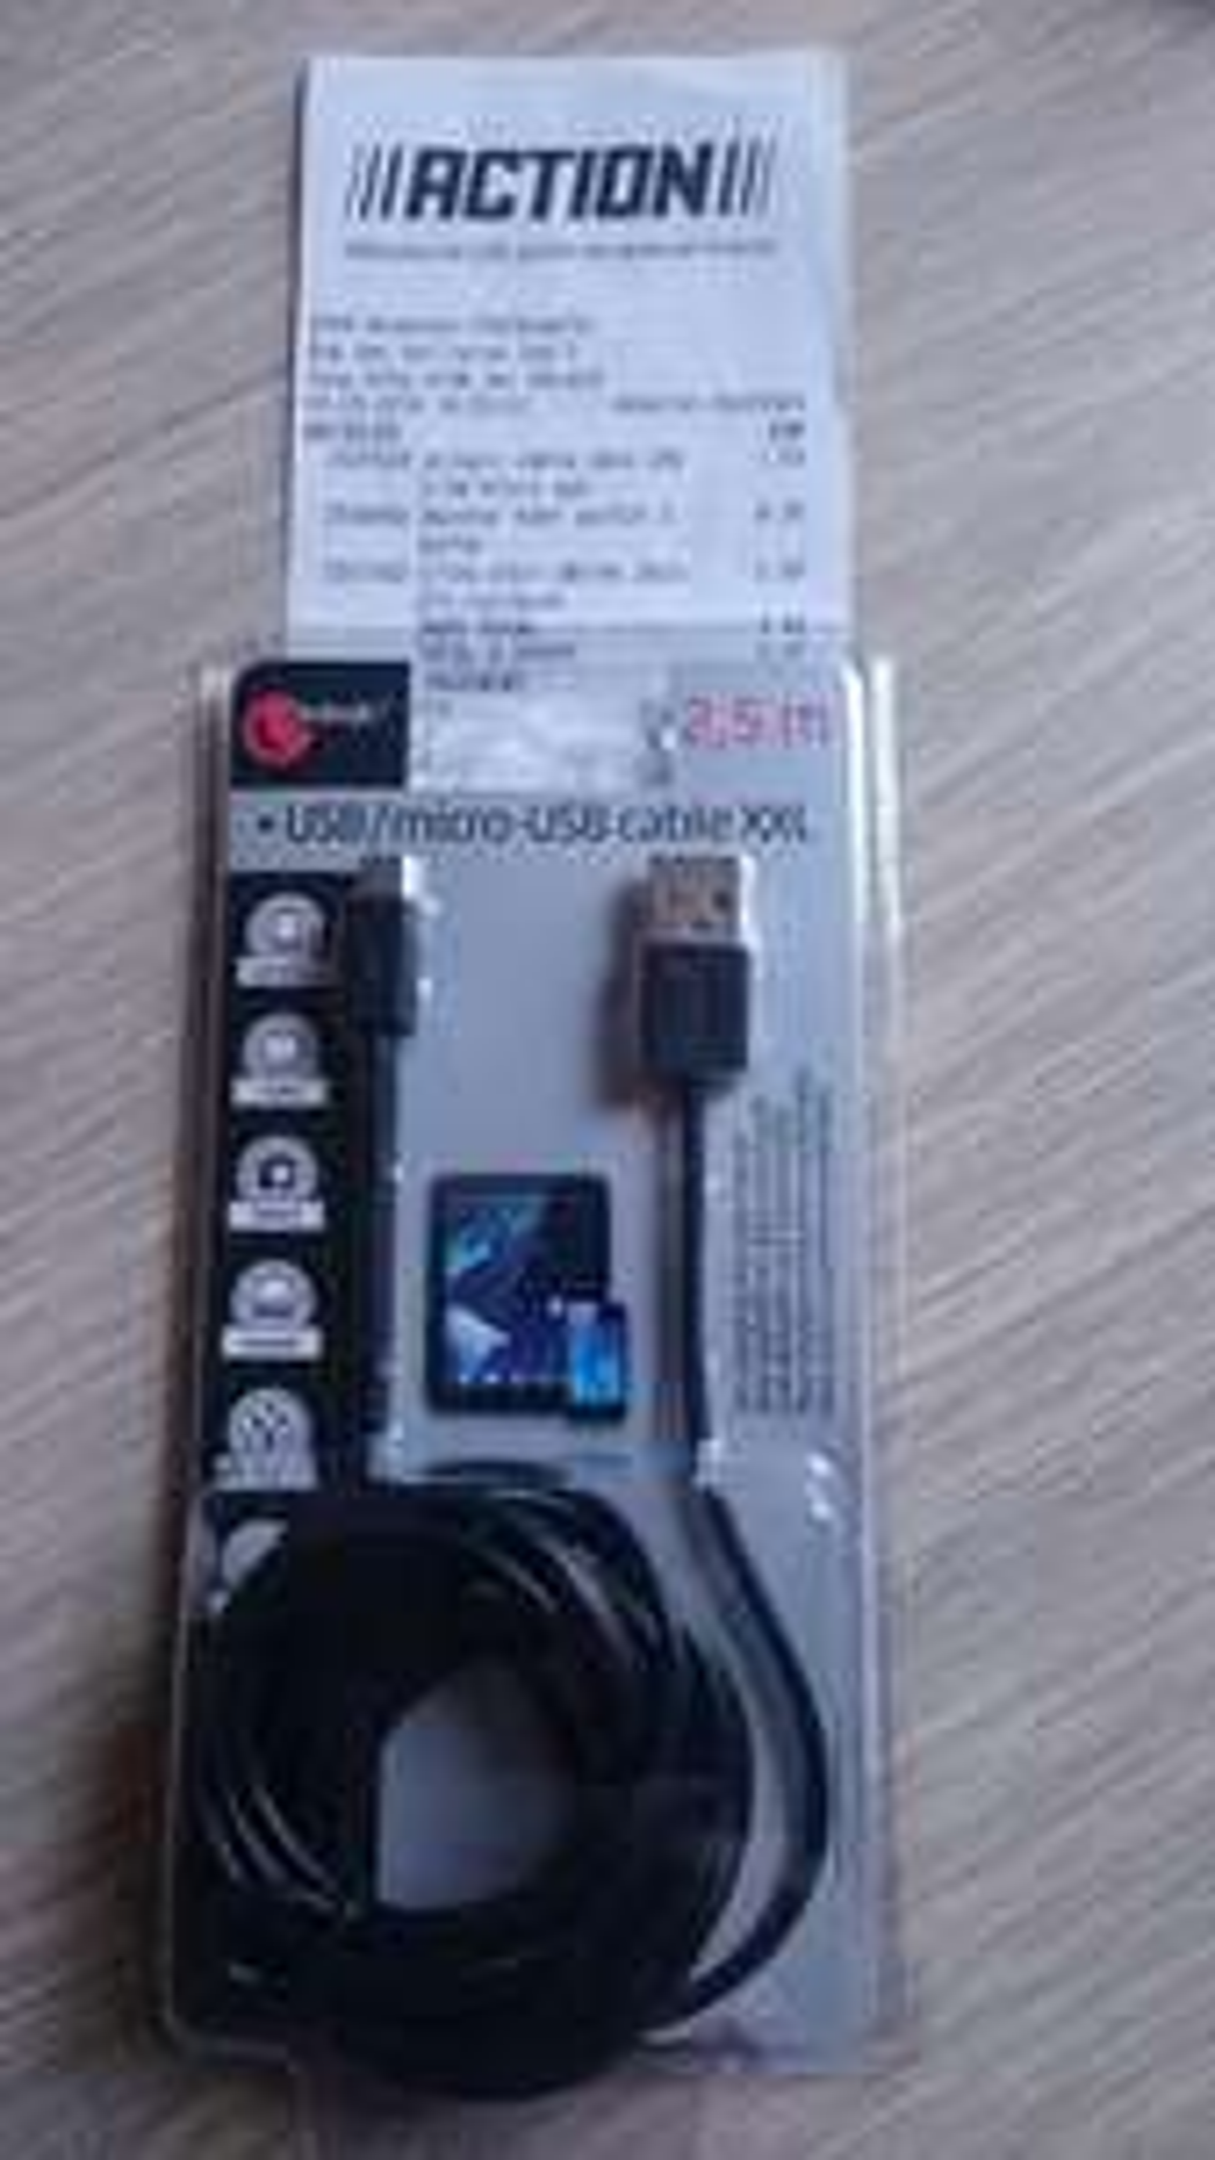 Câble USB / micro USB Sologic (2,5 m)